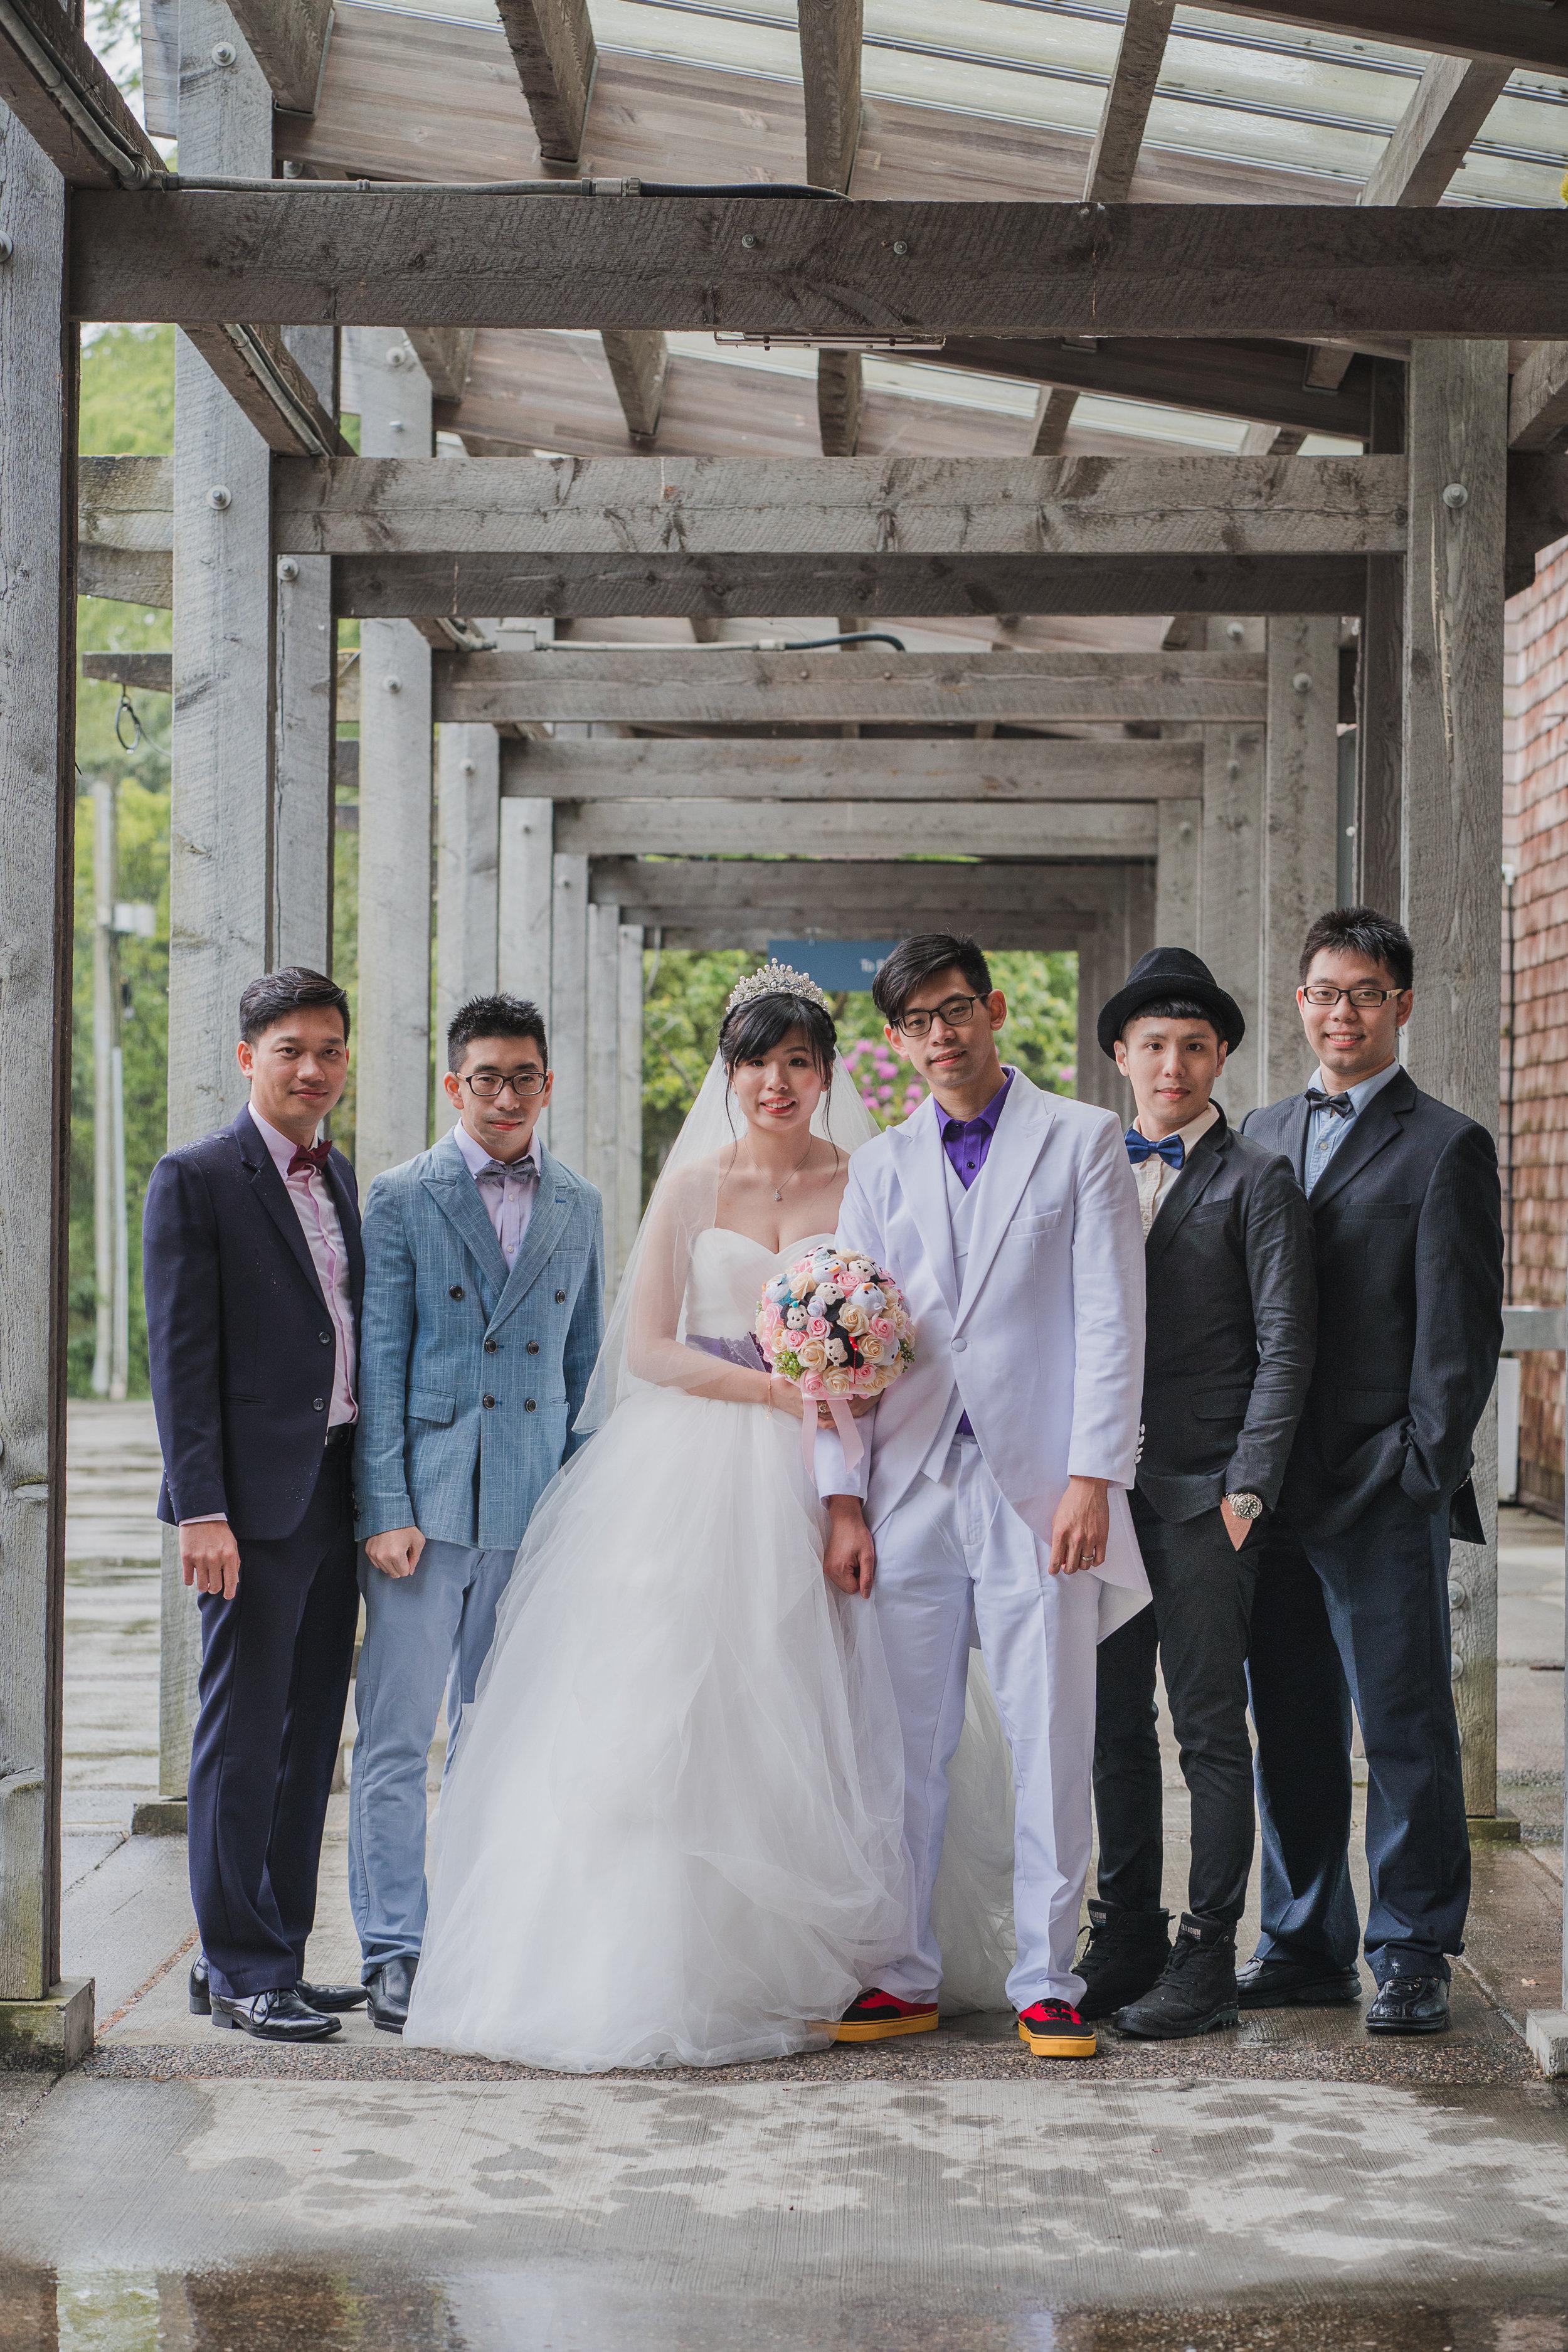 20190520 - Pamela & Matthew Wedding - 0267.jpg